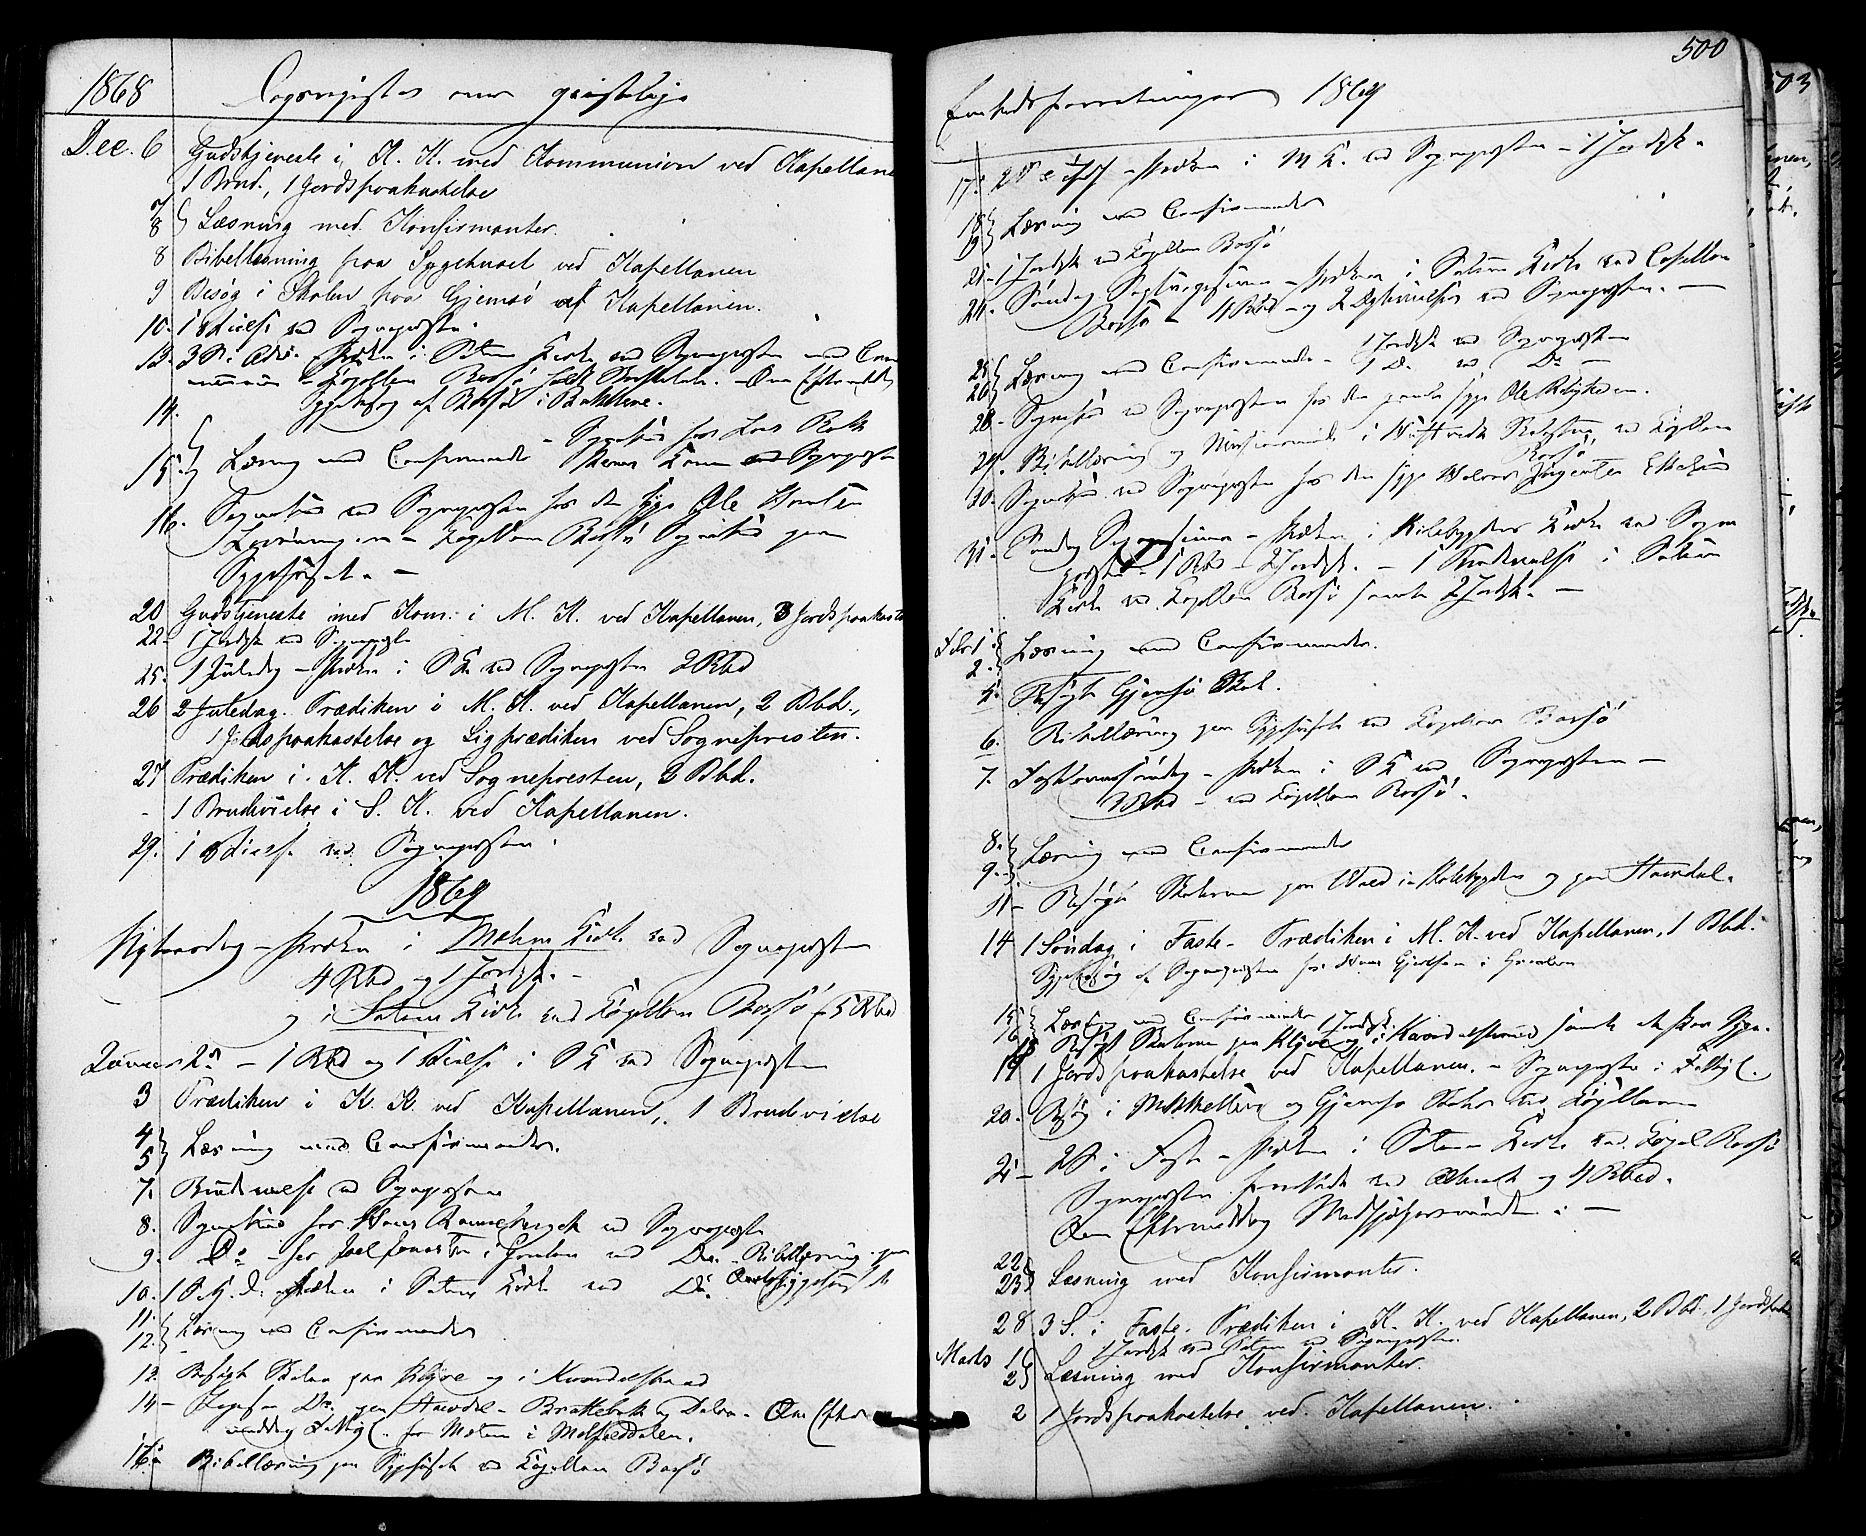 SAKO, Solum kirkebøker, F/Fa/L0008: Ministerialbok nr. I 8, 1865-1876, s. 500